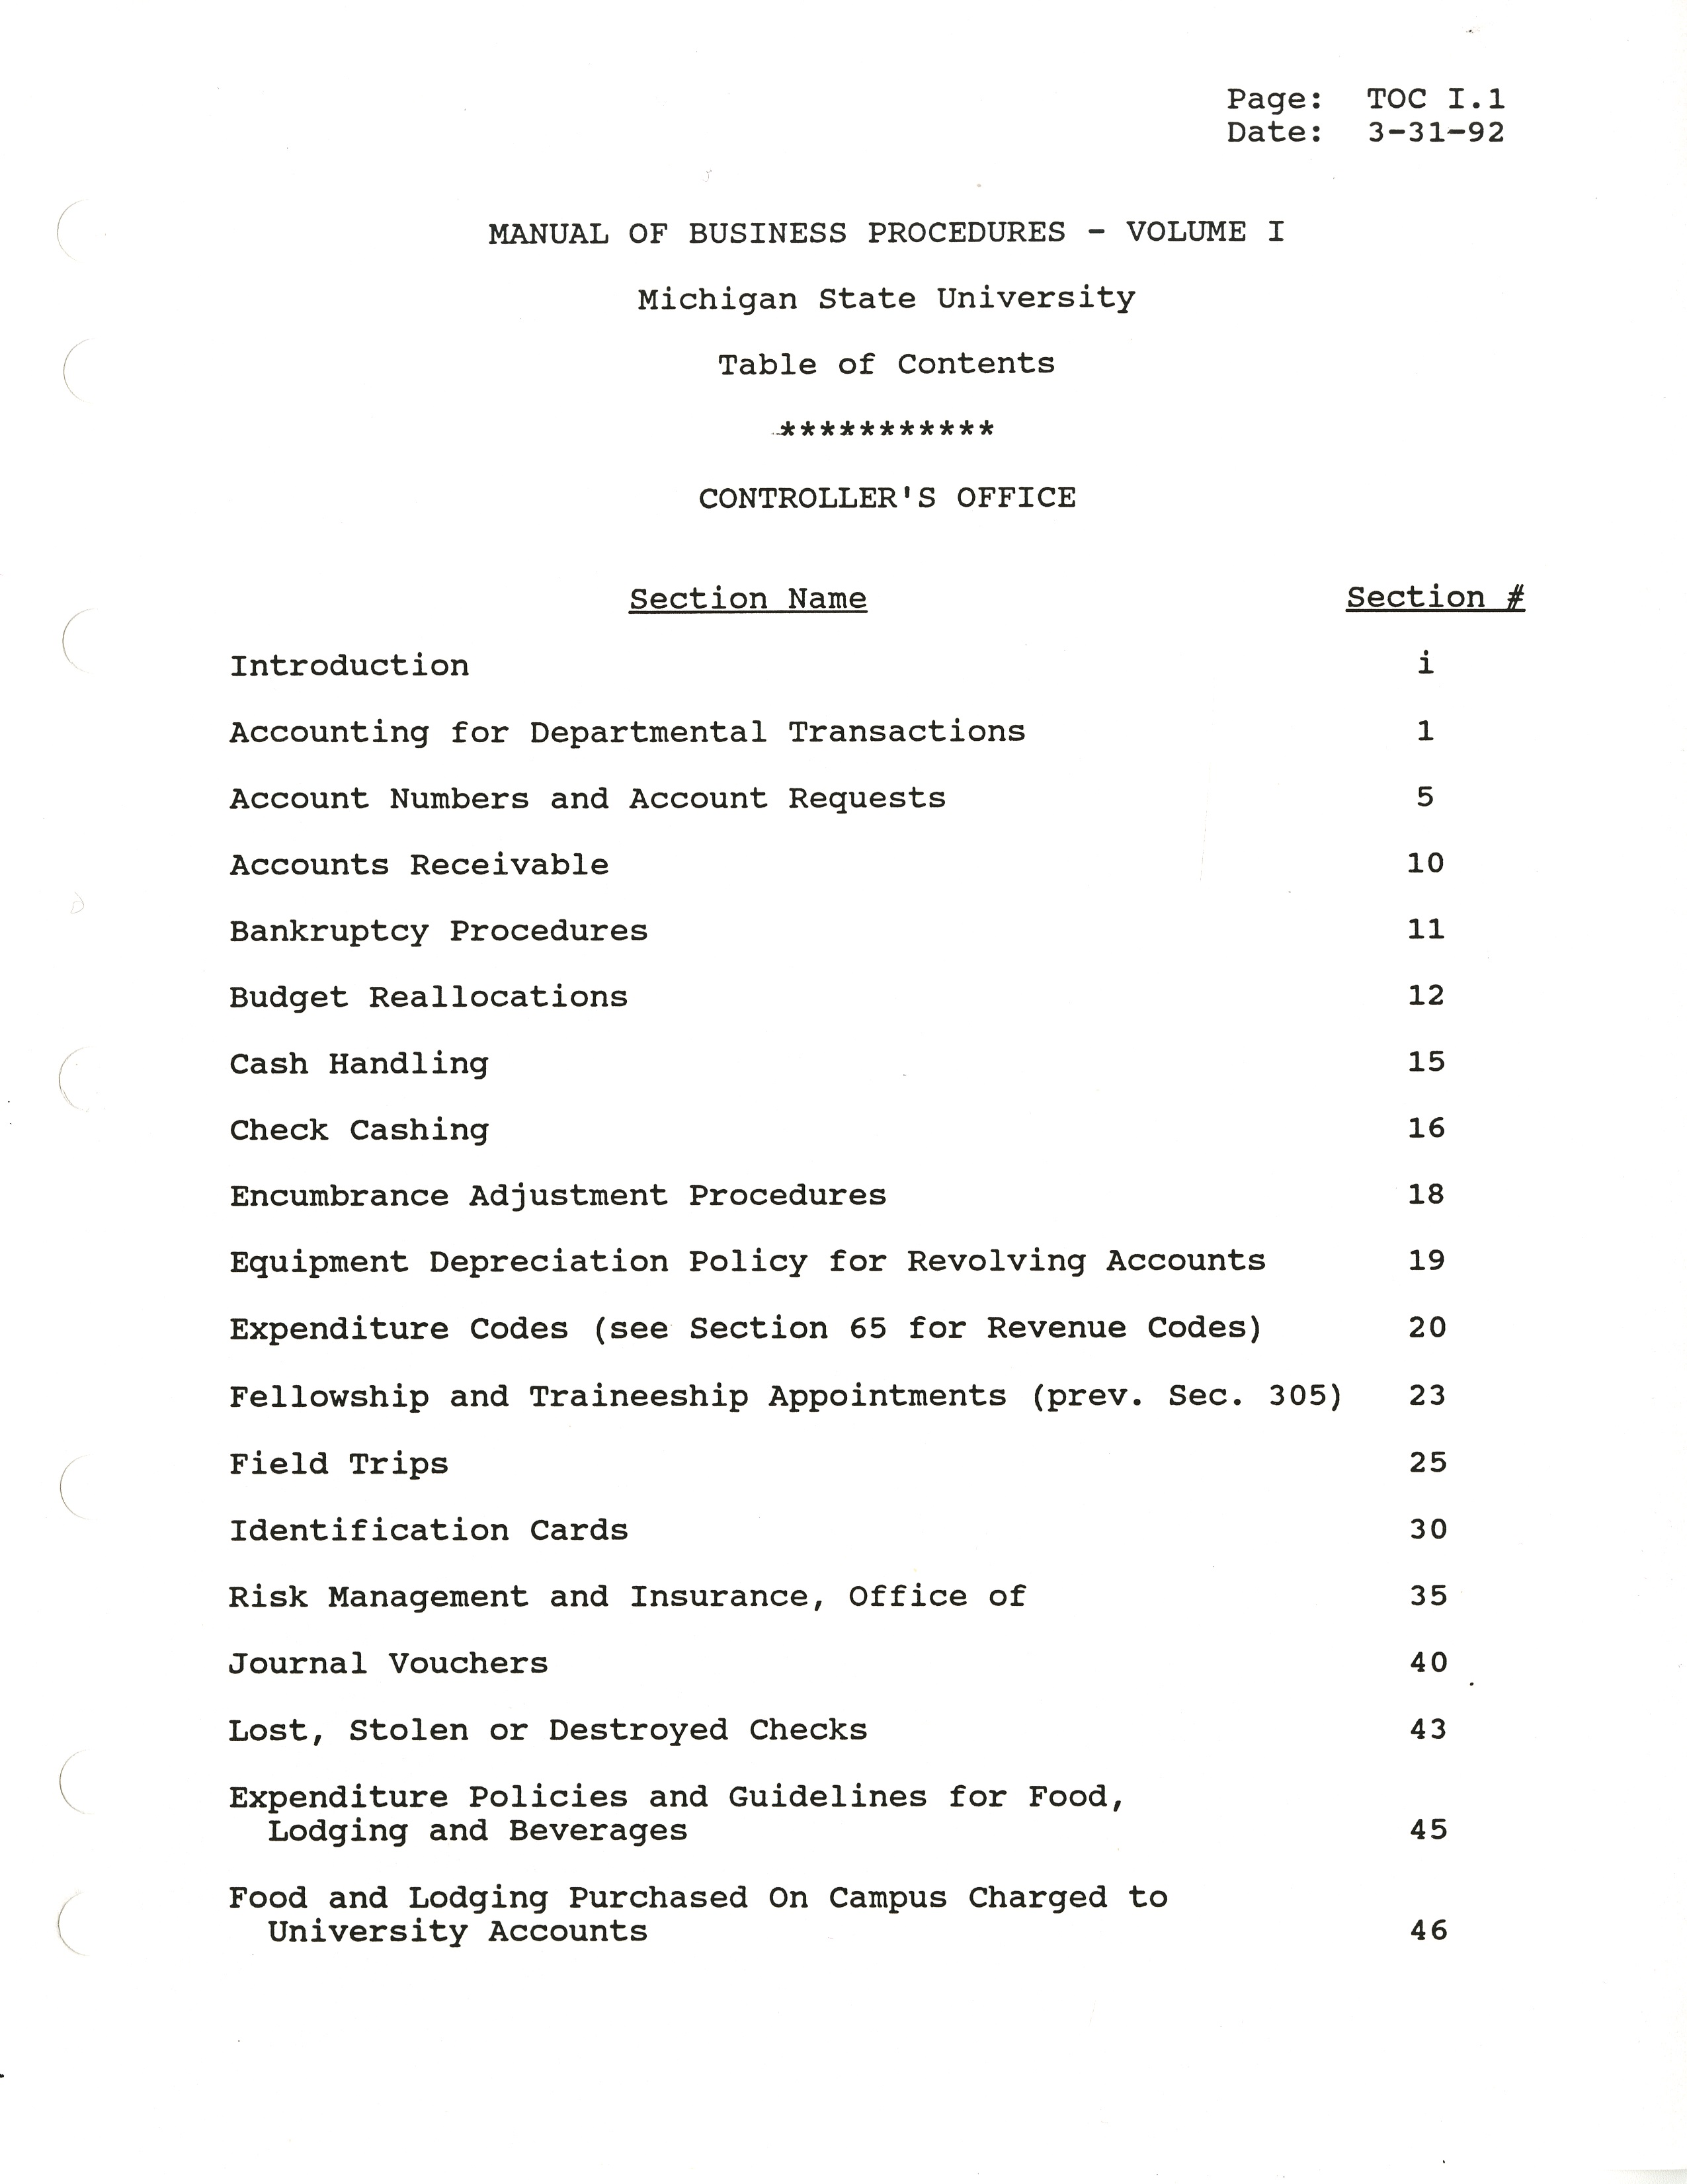 MSU Manual of Business Procedures, 1992